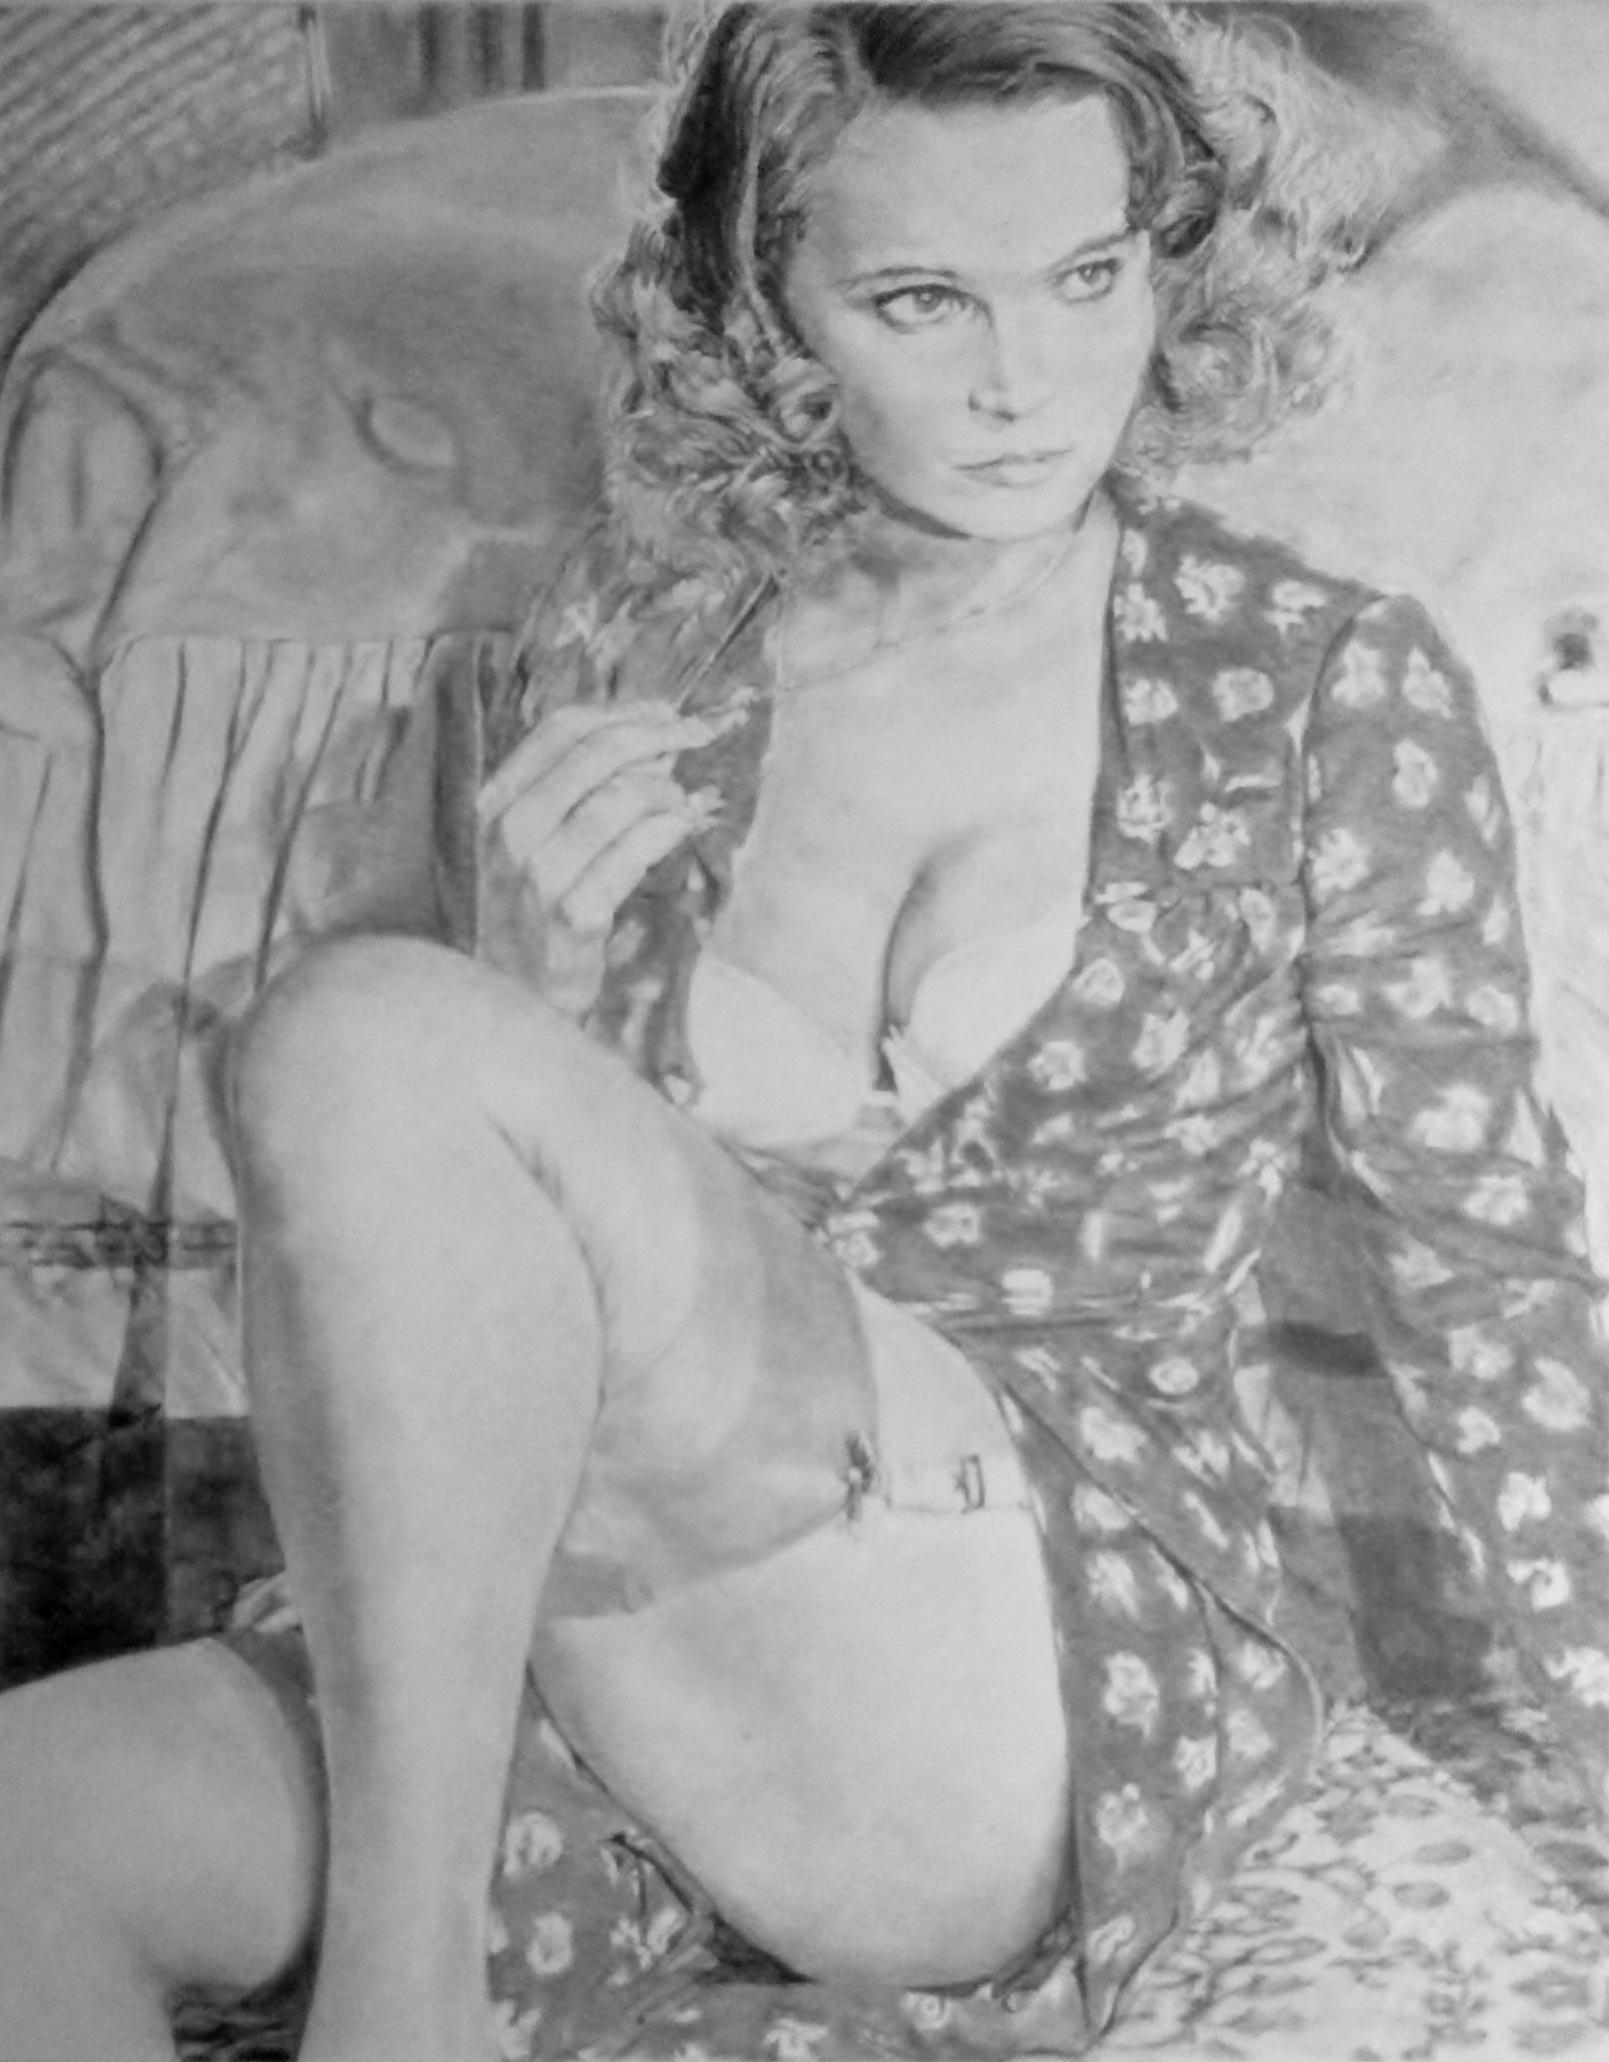 Laura Antonelli (Malicia) by stevie-wydder